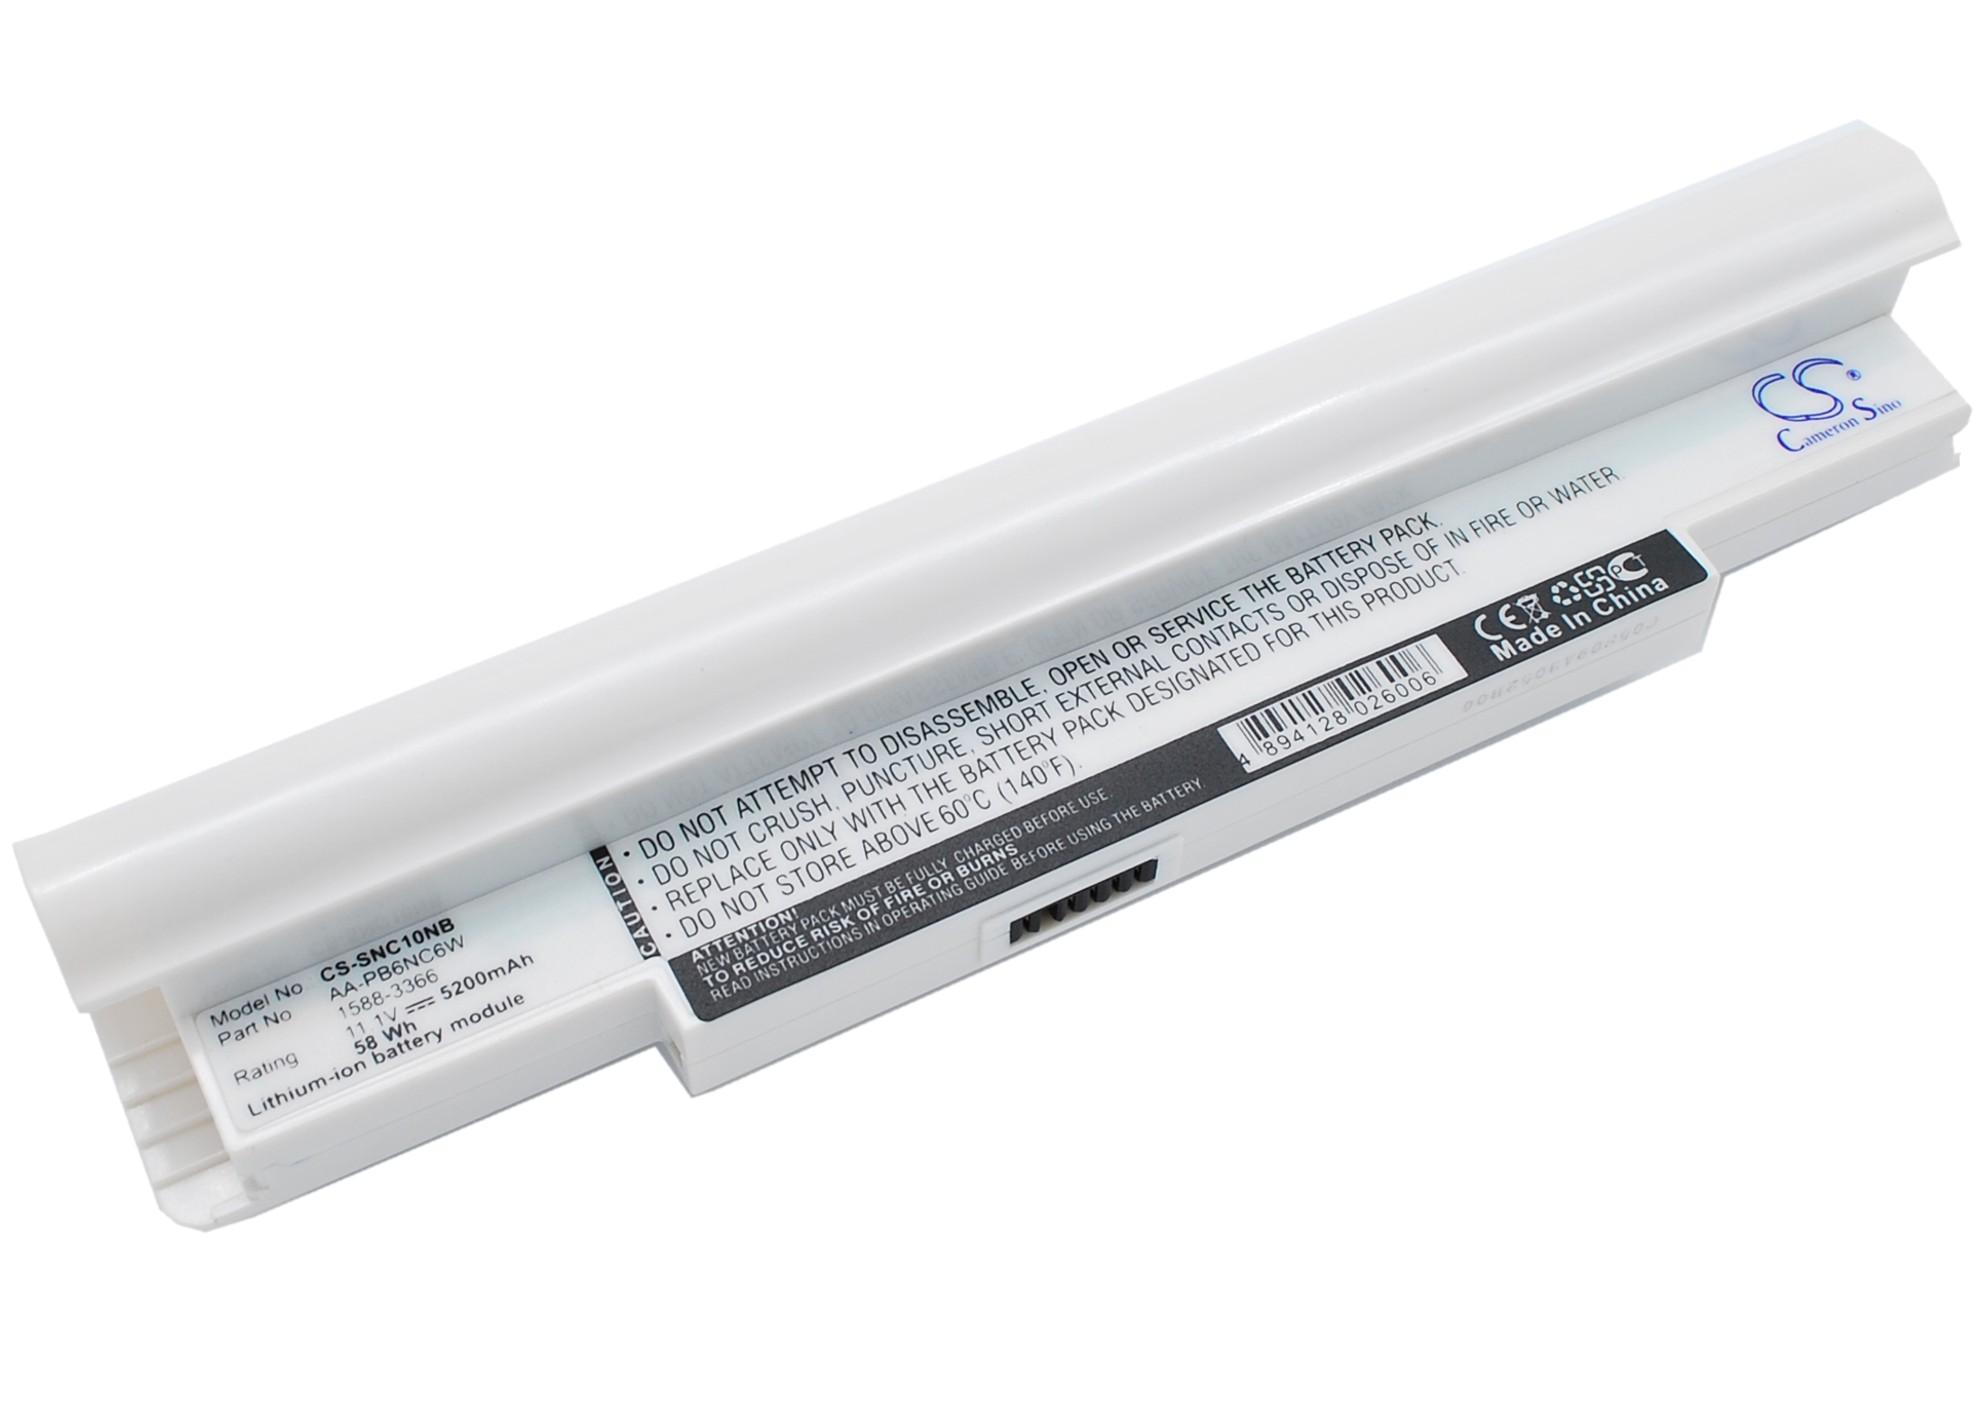 Cameron Sino baterie do notebooků pro SAMSUNG NP-N130 11.1V Li-ion 5200mAh bílá - neoriginální